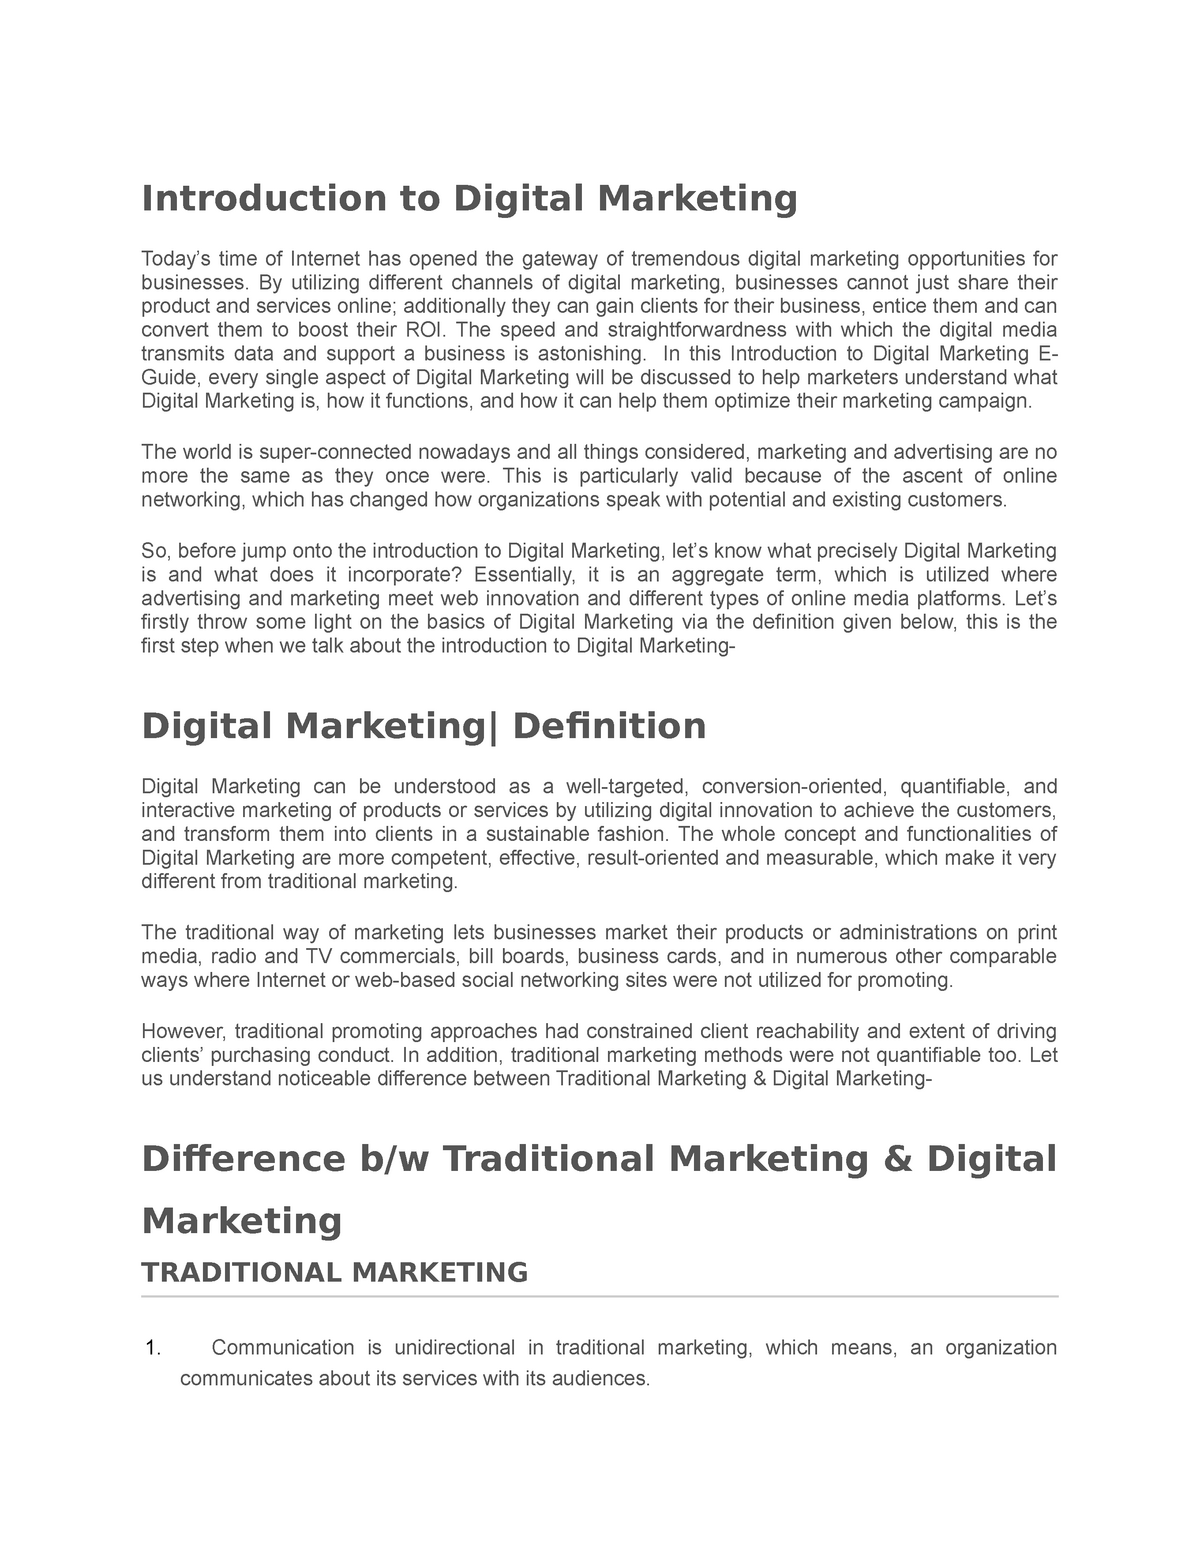 Introduction to Digital Marketing - MBA 2932 - StuDocu